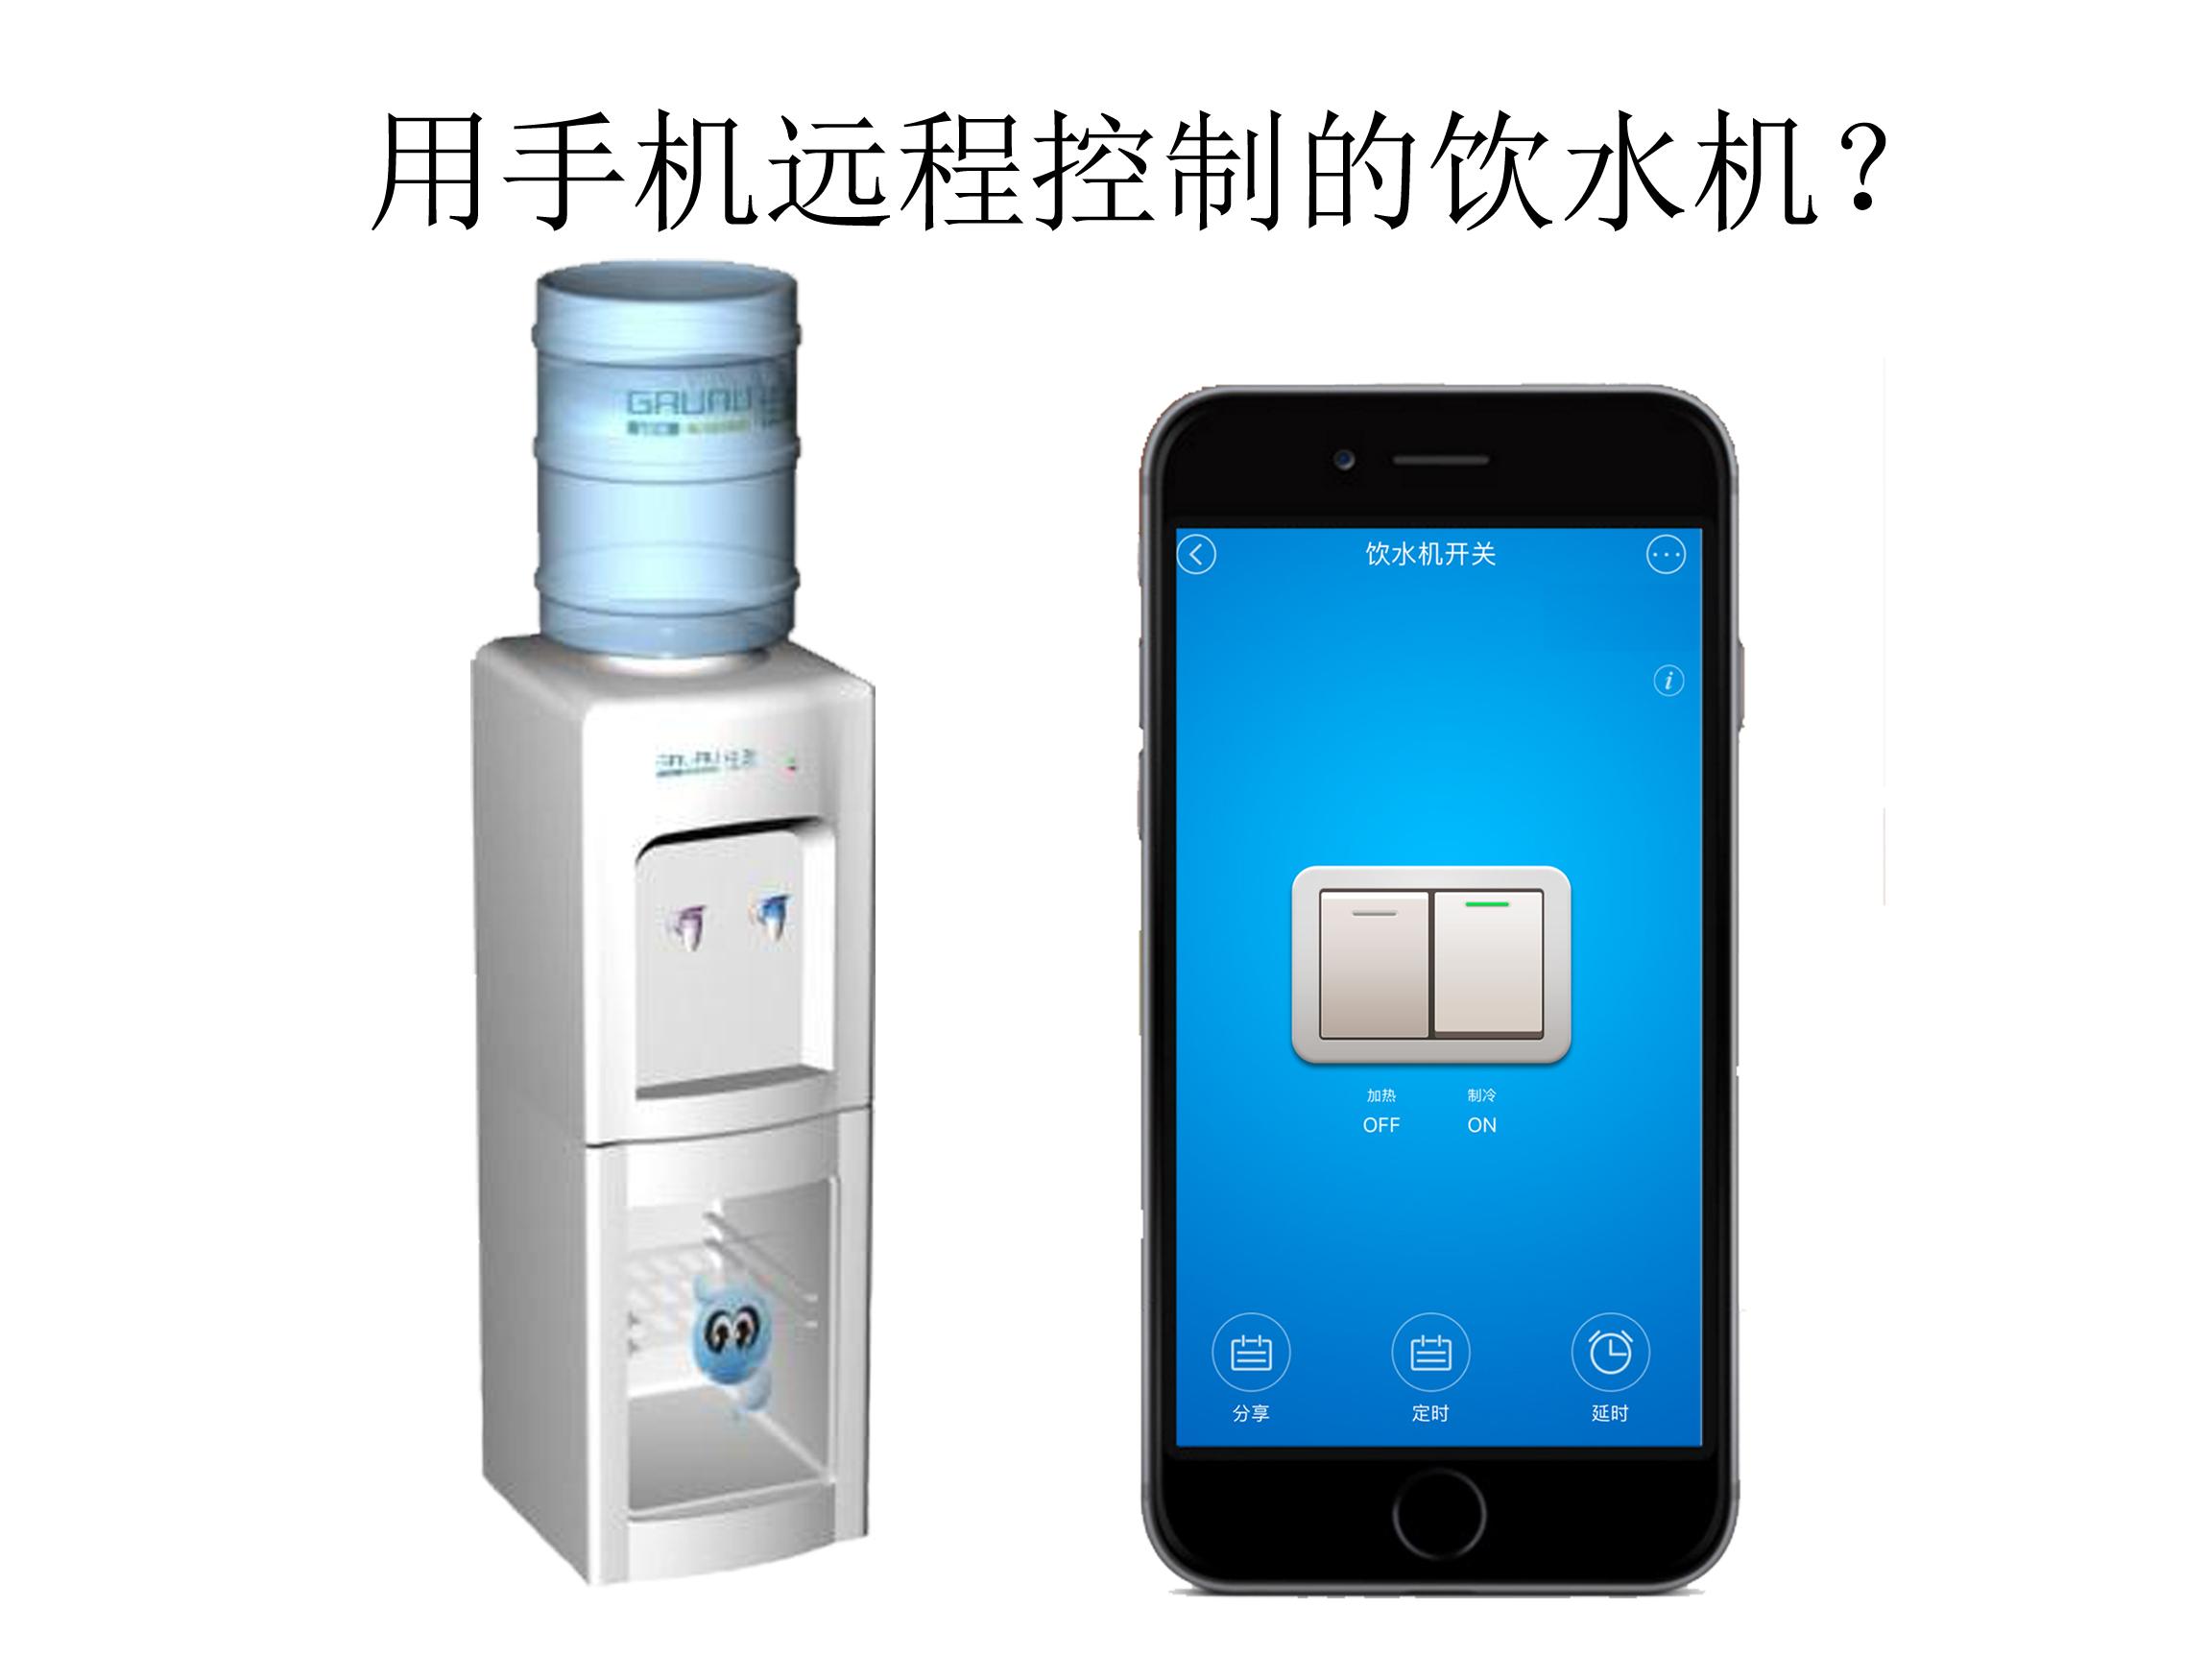 What?饮水机也能用手机远程开关了?